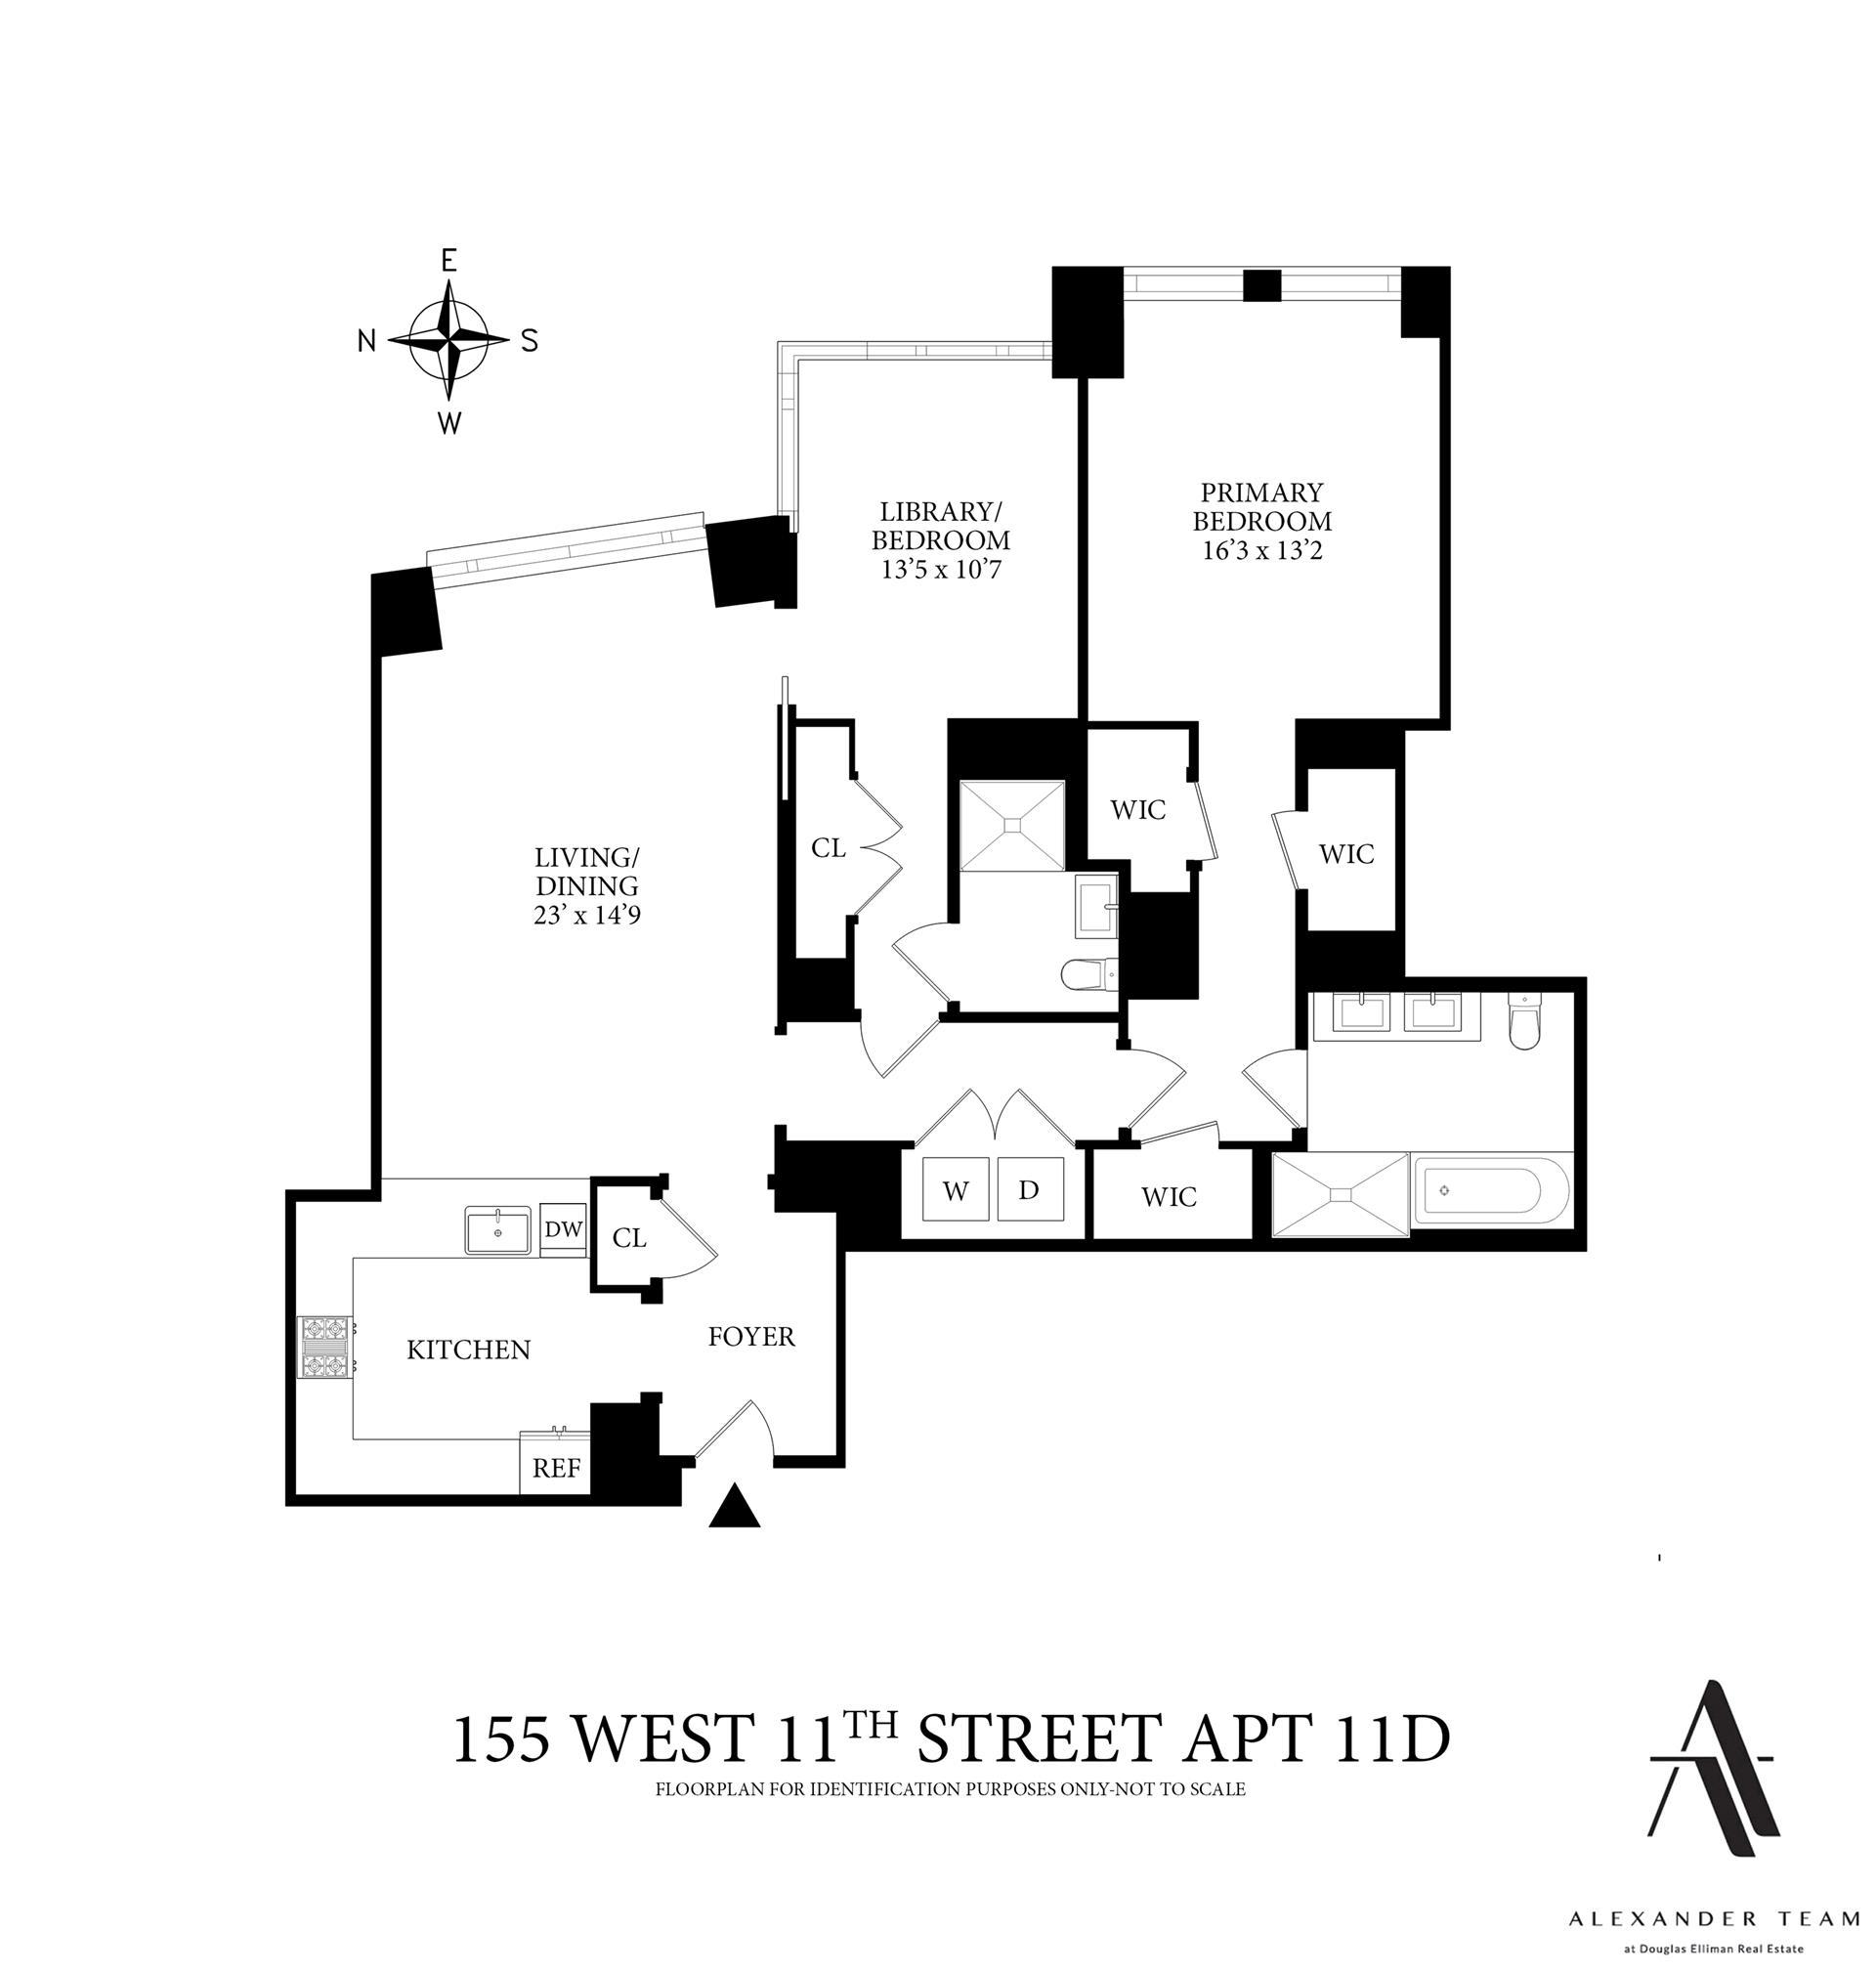 155 West 11th Street Greenwich Village New York NY 10011